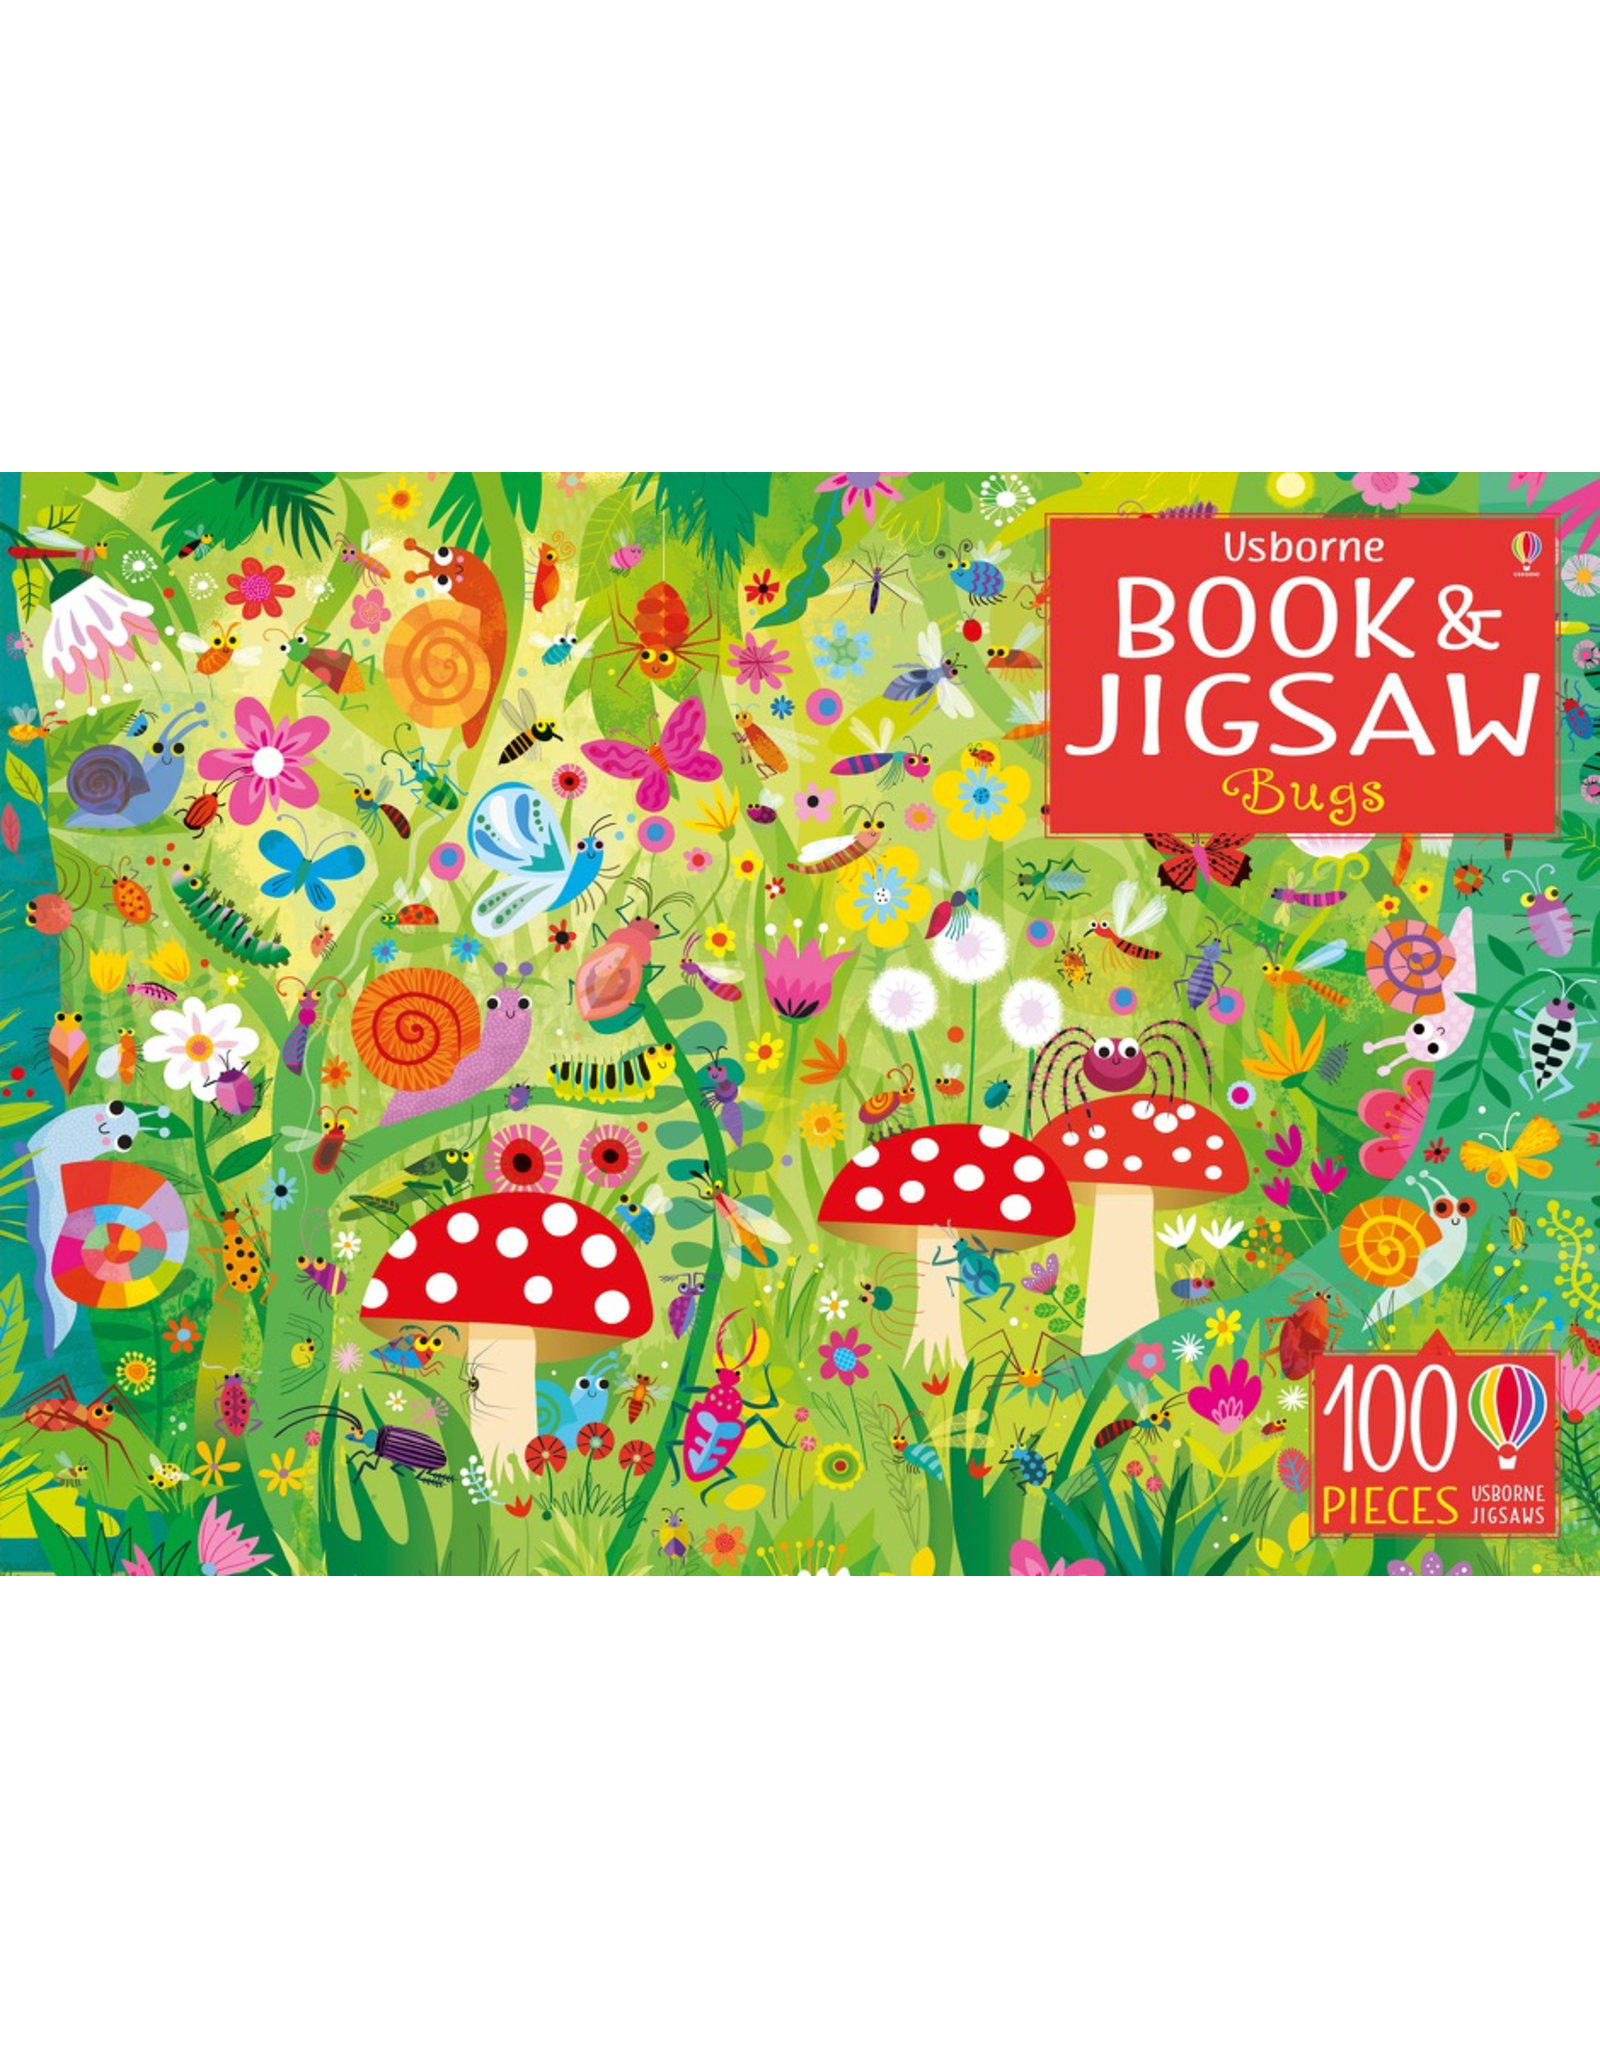 Usborne PICTURE PUZZLE BOOK & JIGSAW BUGS 100 PIECES